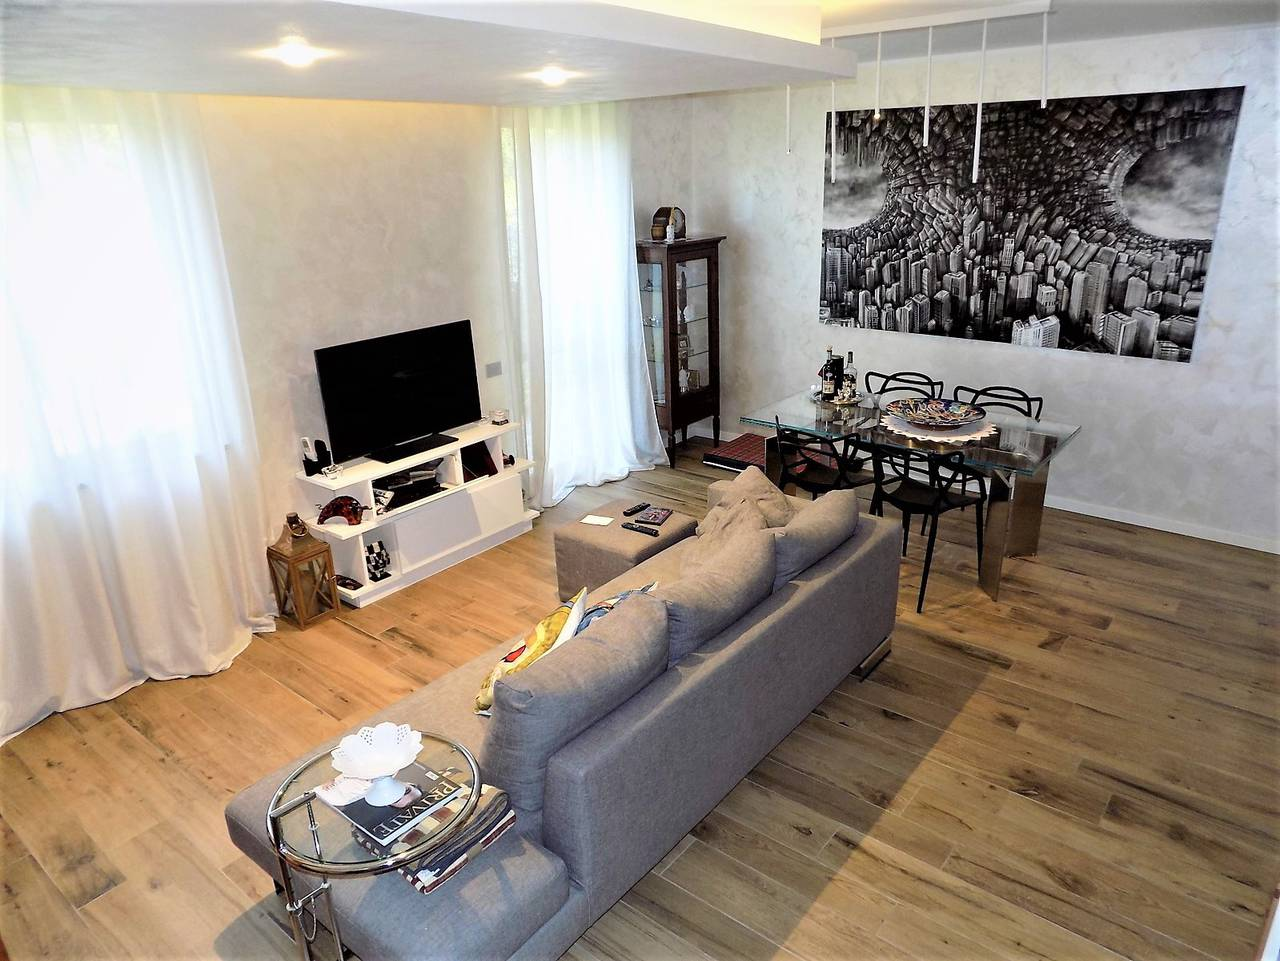 Porzione-villa-bifamigliare-ristrutturata-in-vendita-a-Carnate-1